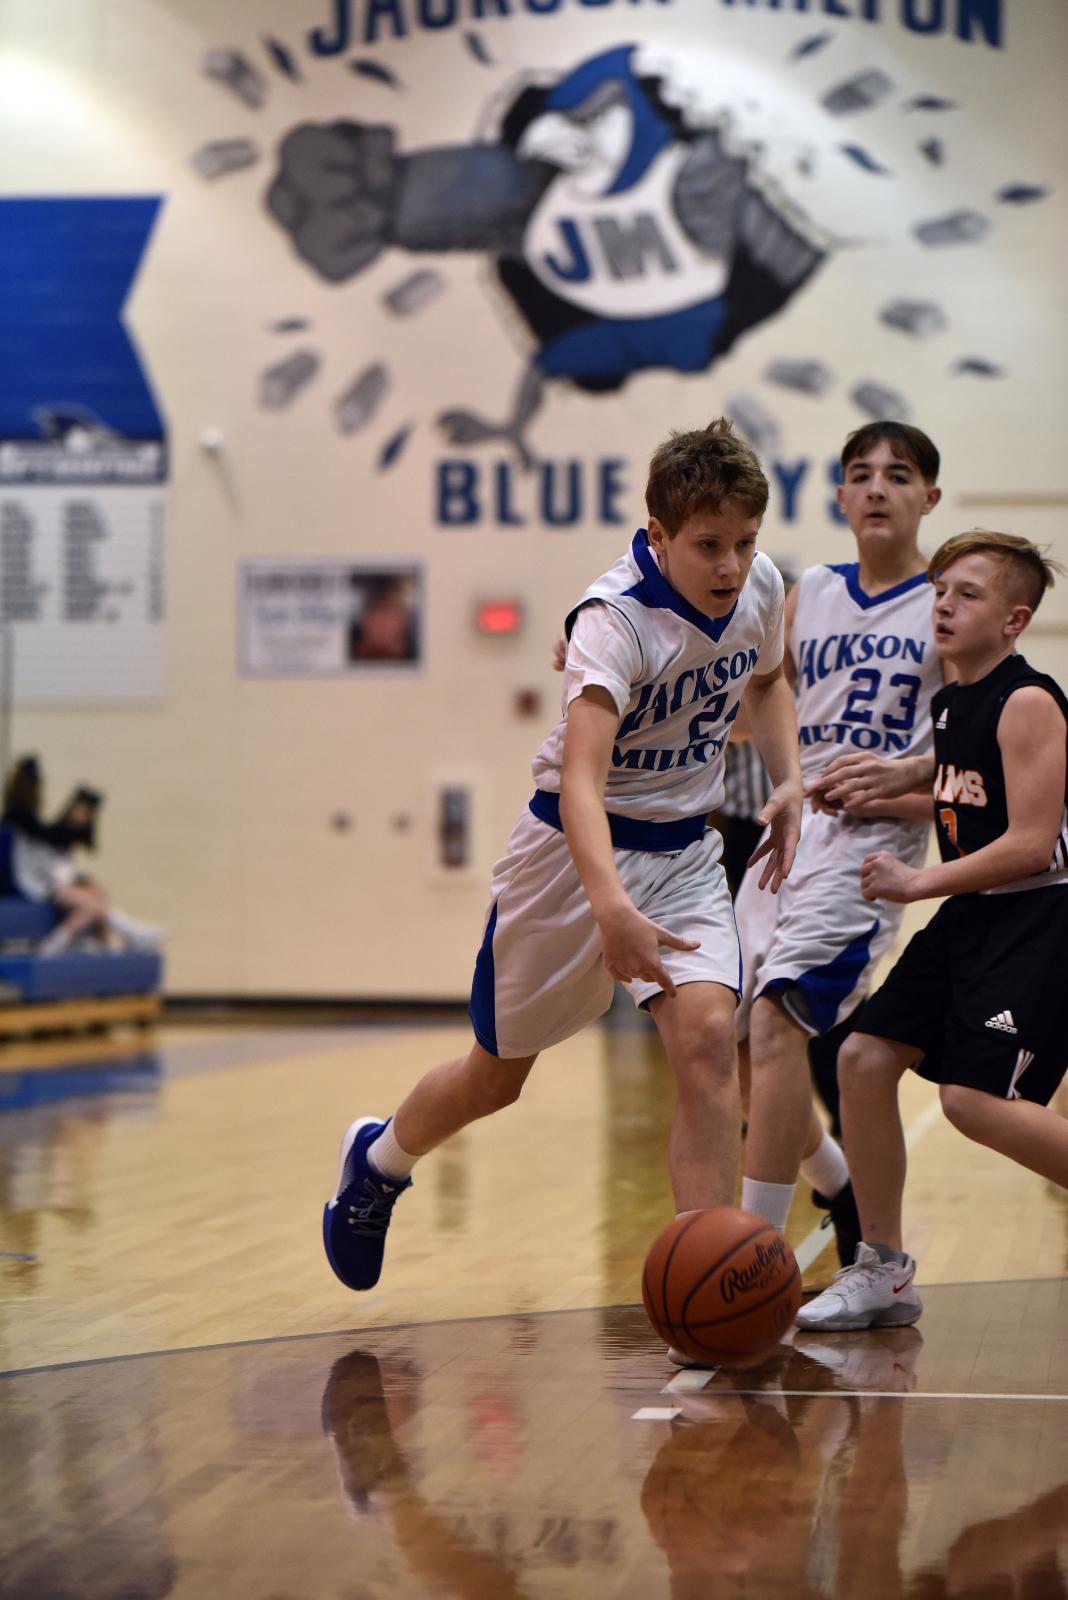 Boy's Basketball 7,8,9th grade Jan. 20, 2021